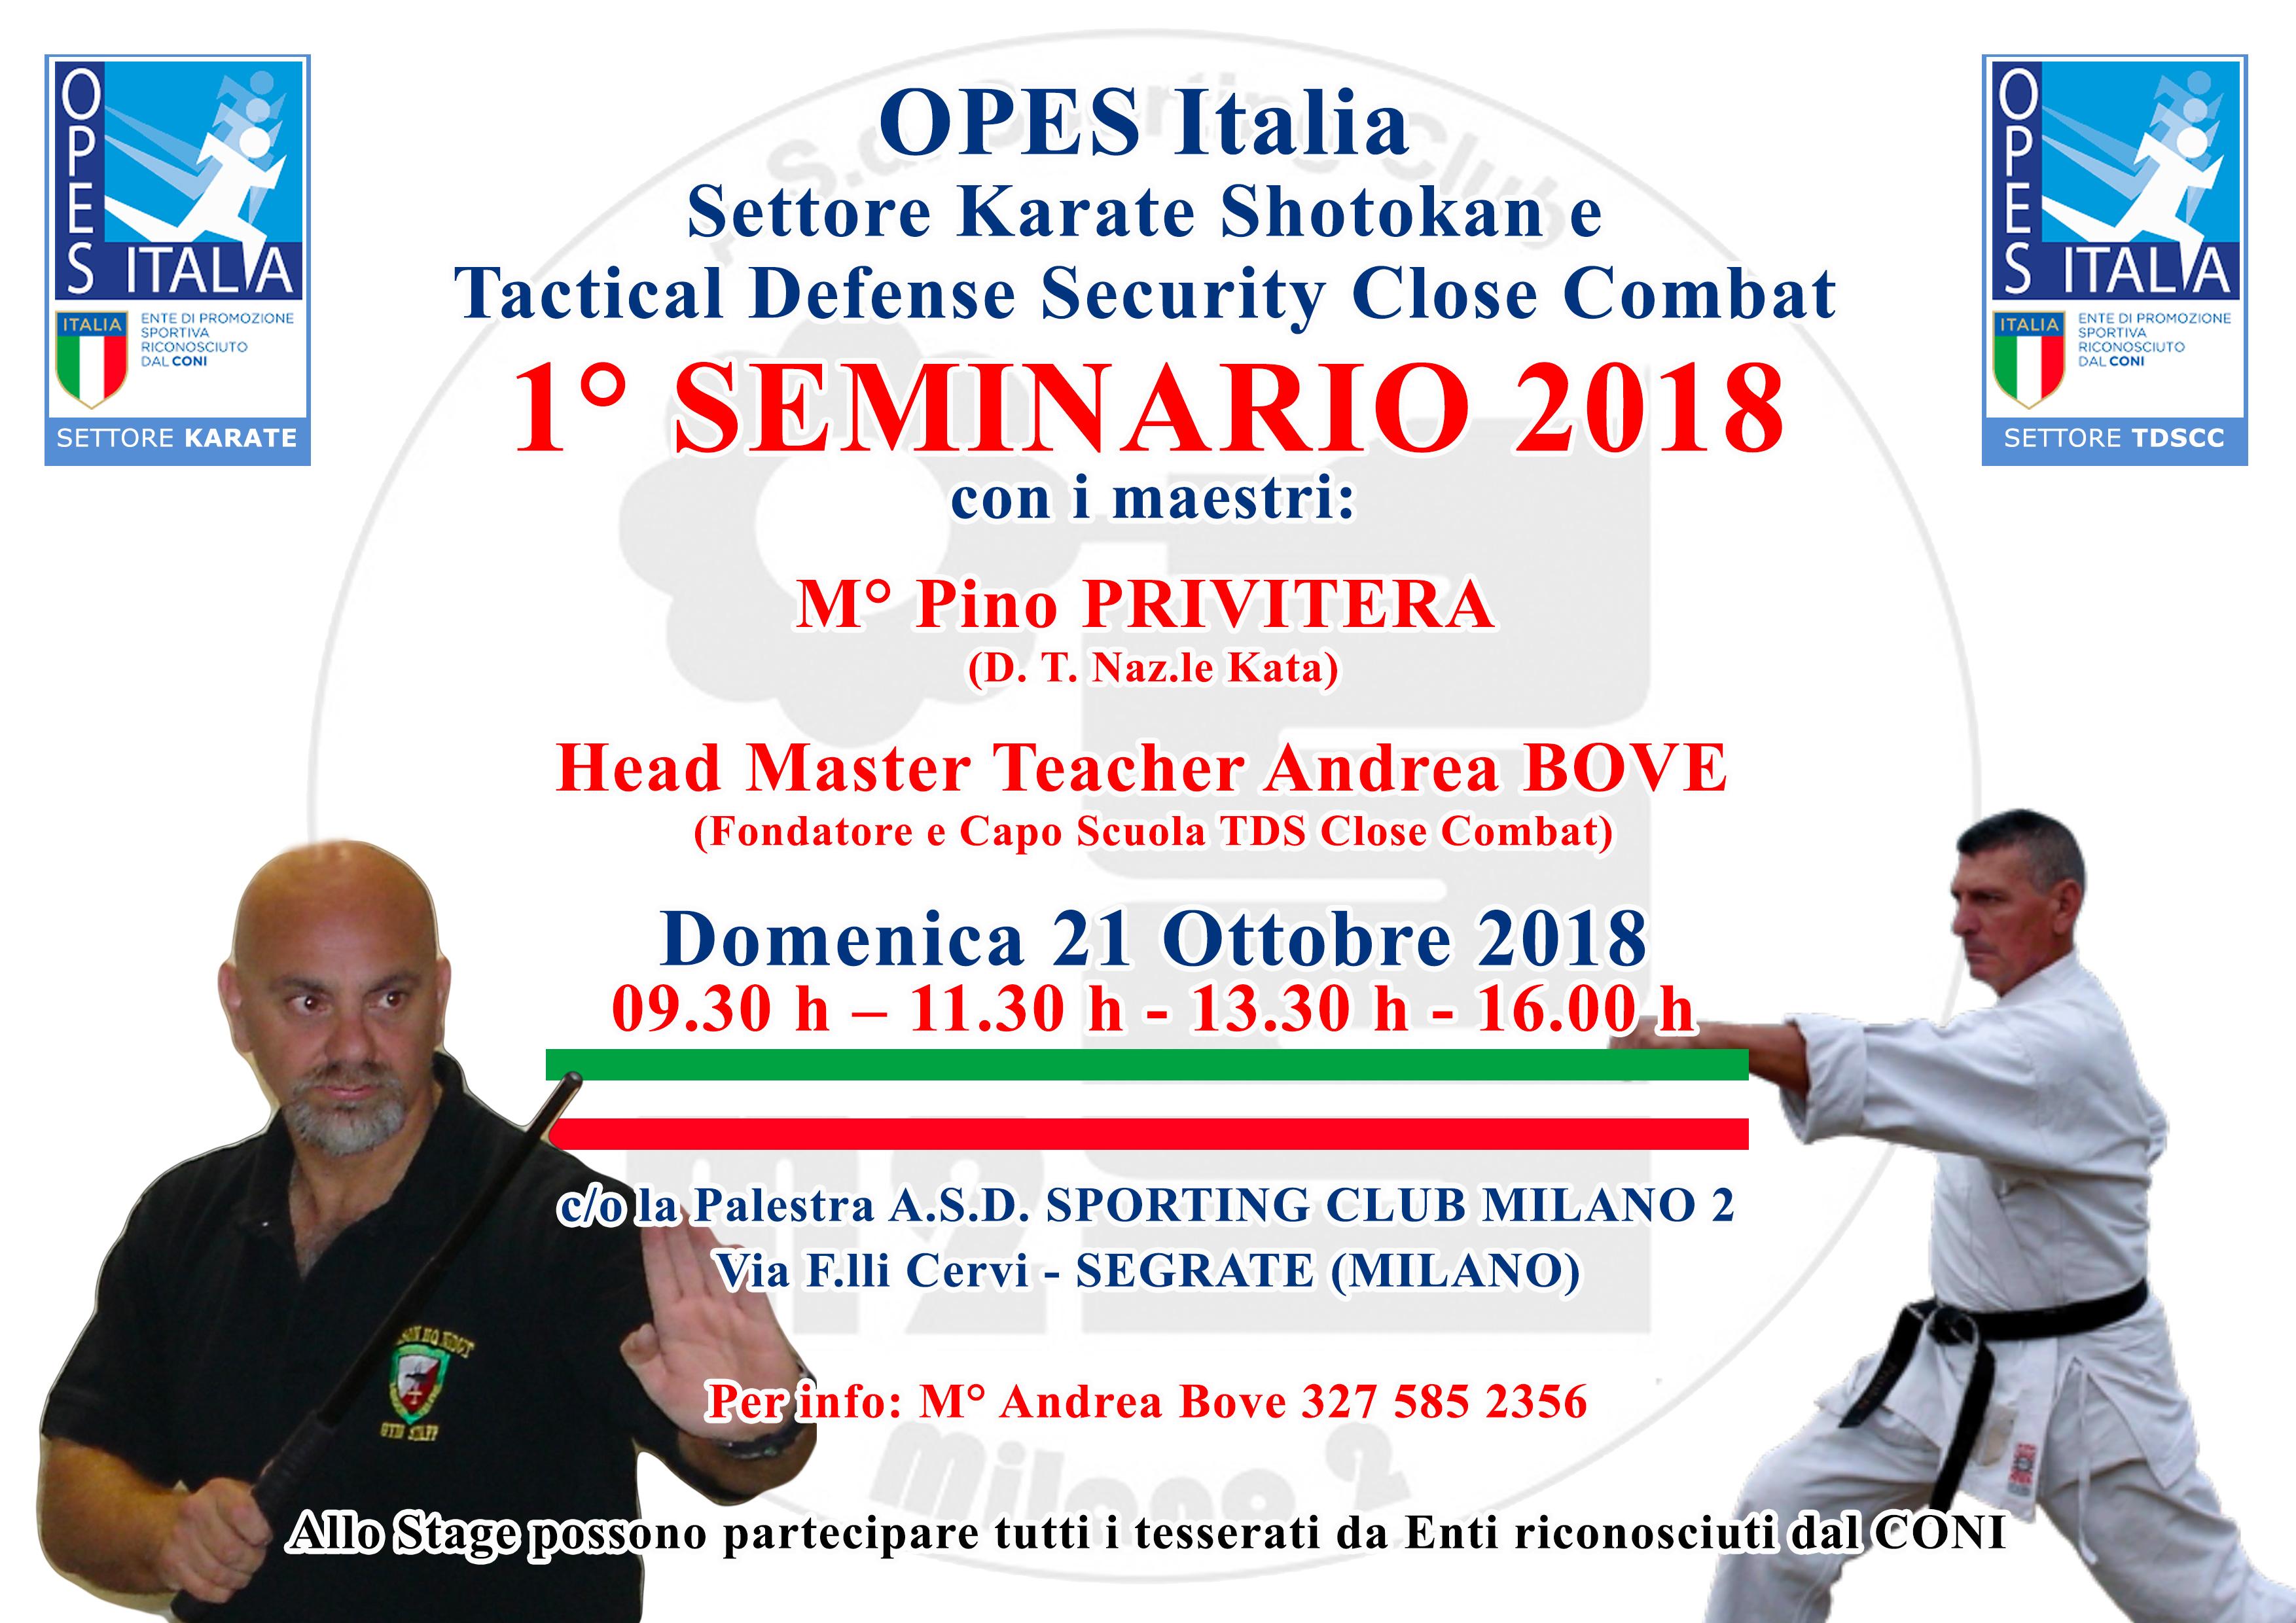 stage_21_ottobre_milano2-2